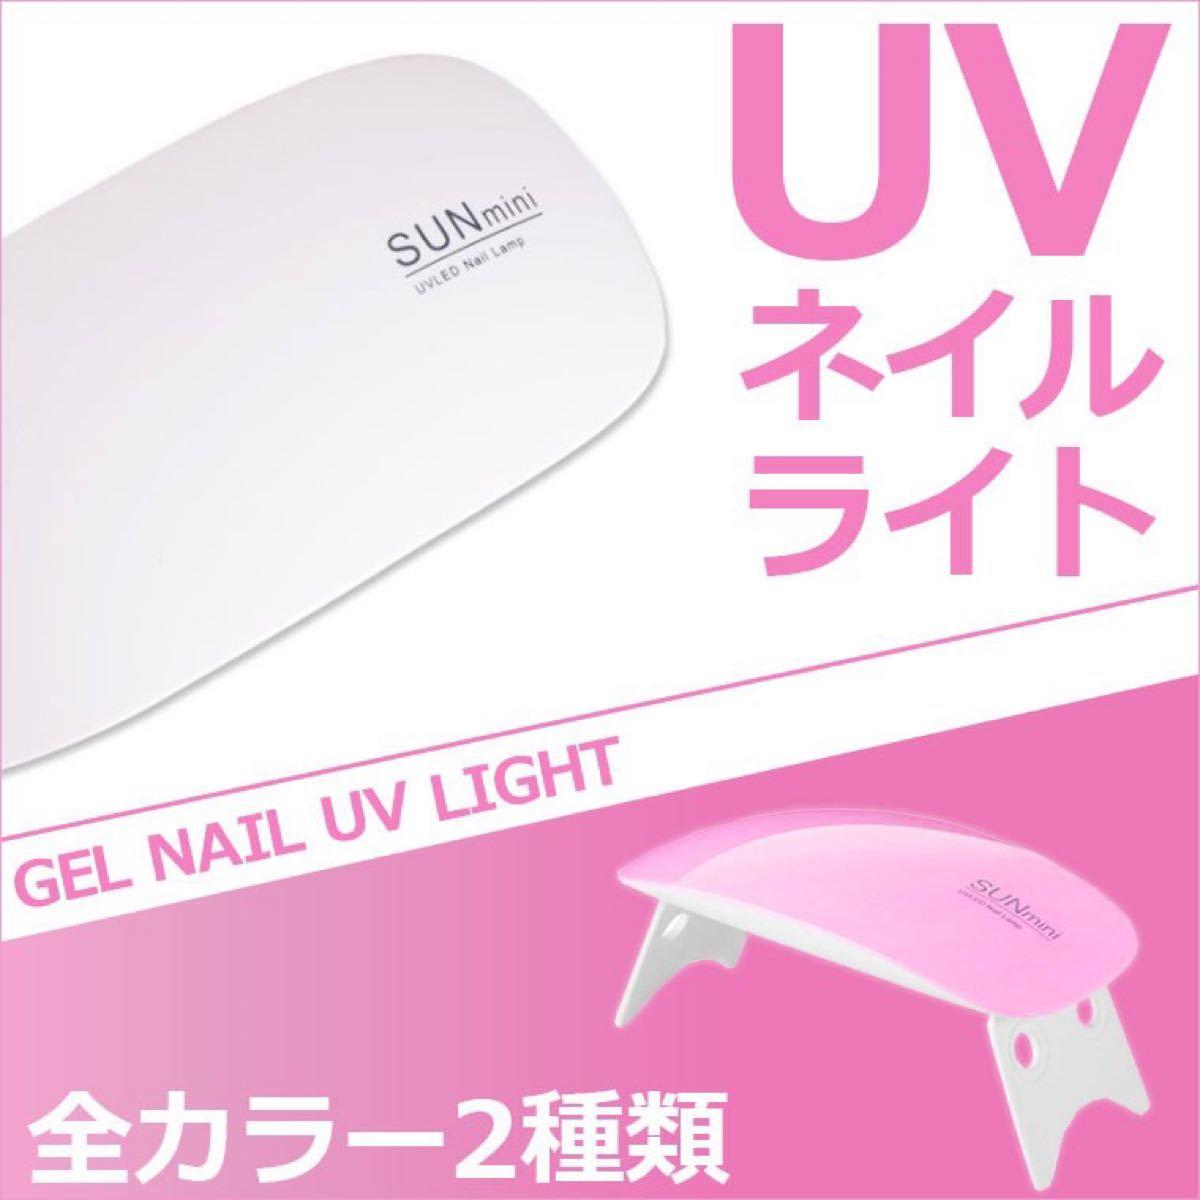 UV+LEDライト ジェル ネイル UVレジン 硬化用 ライト